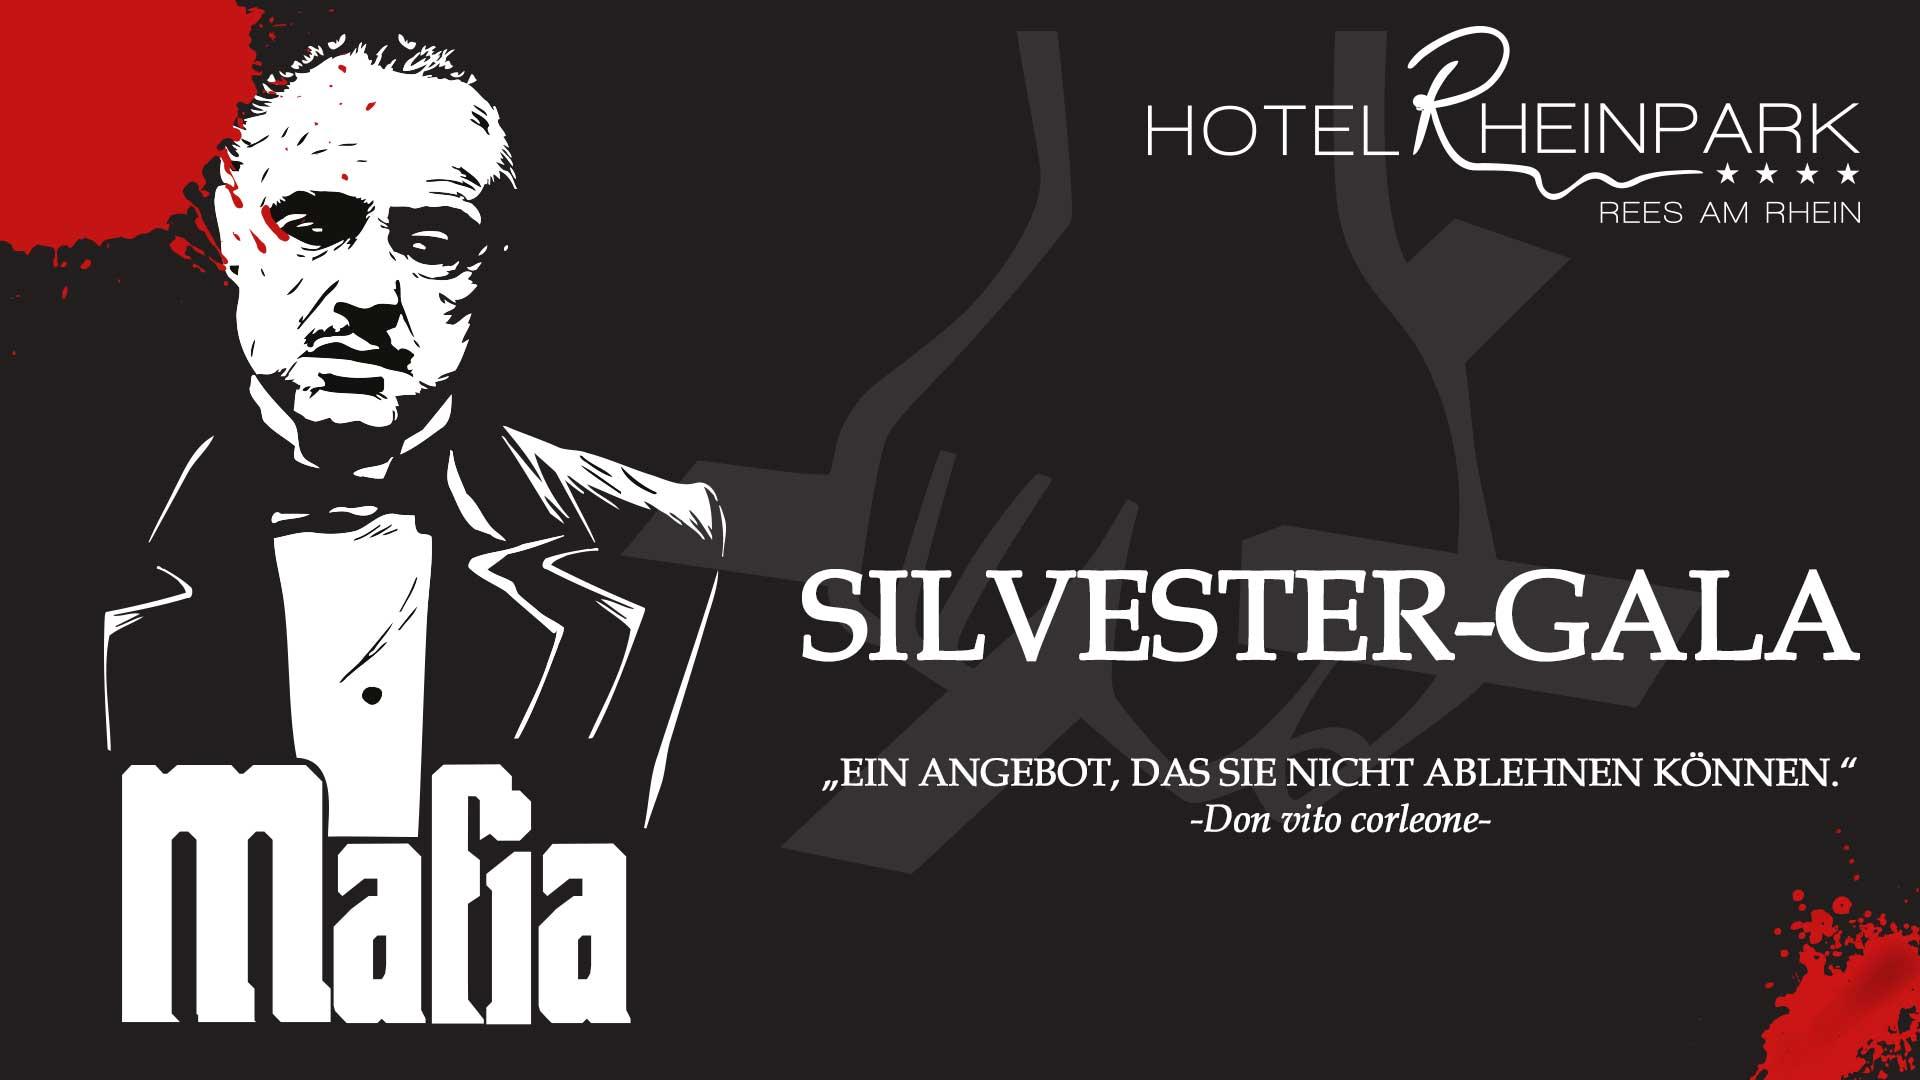 Silvester-Gala Mafia - Hotel Rheinpark Rees